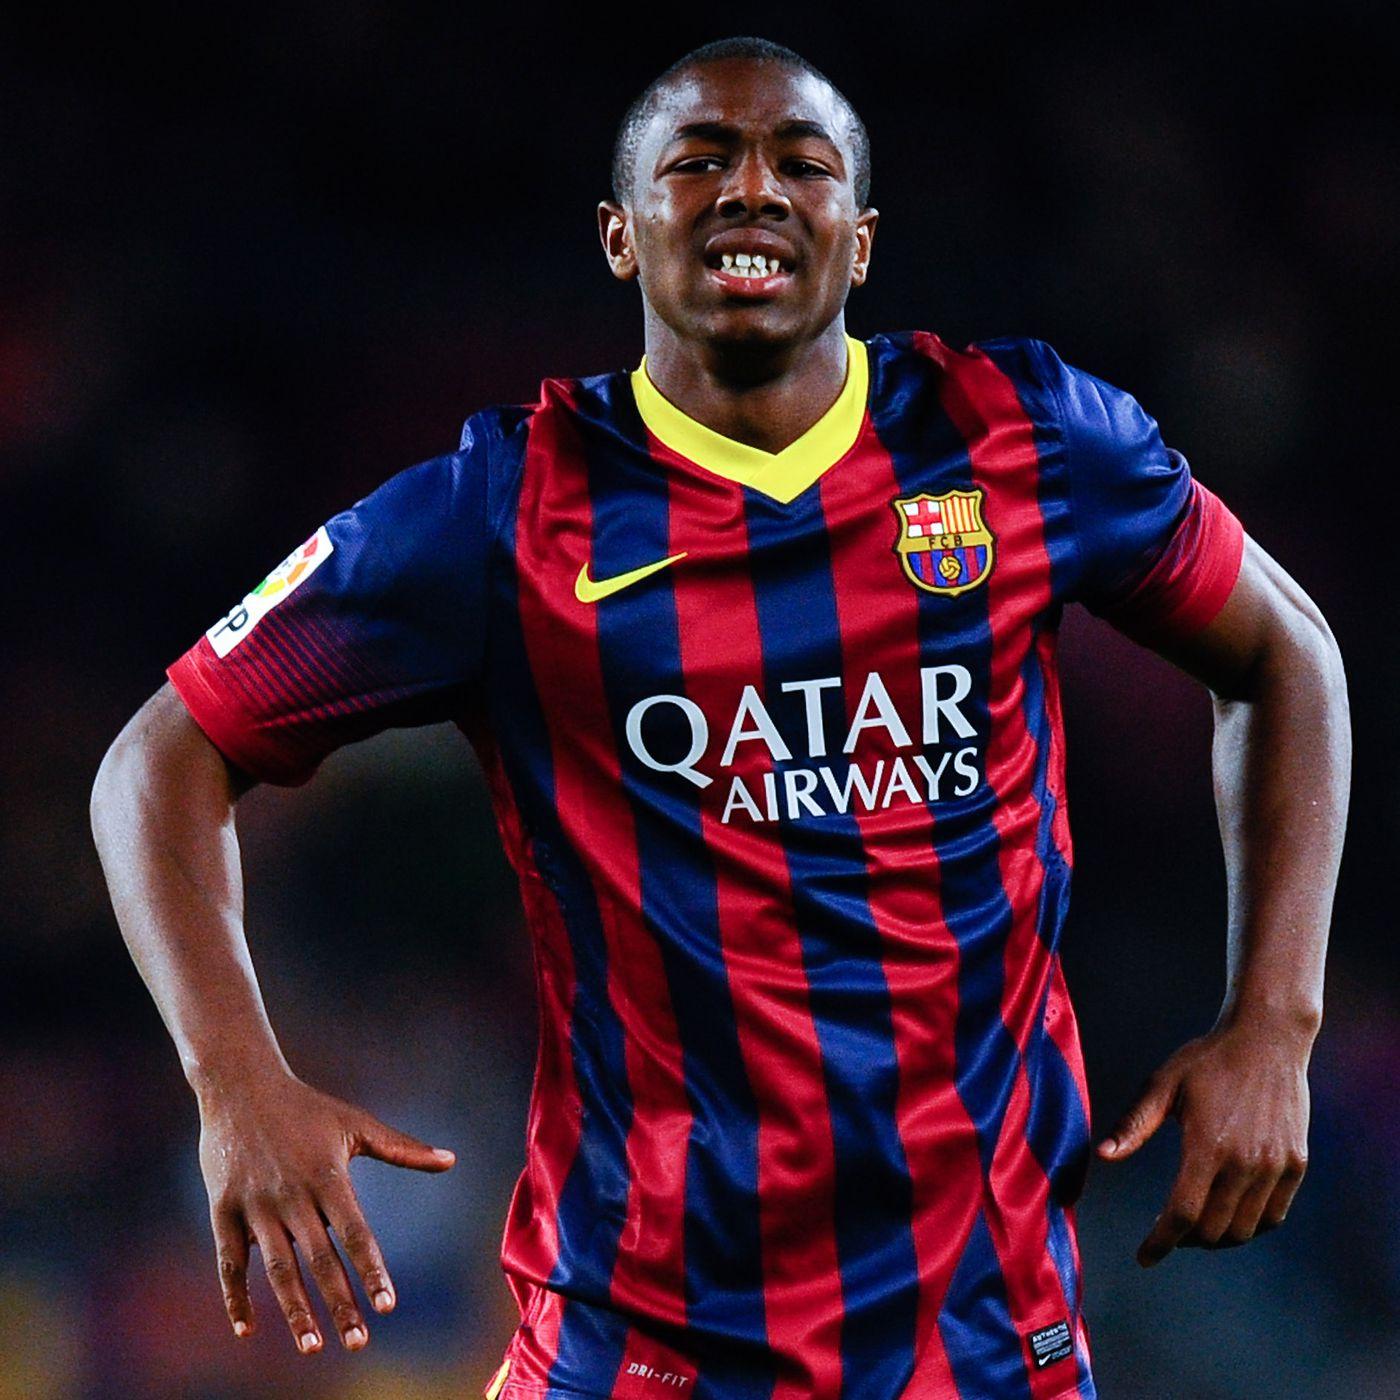 Report: Barcelona winger Adama Traoré transfer to Premier League a done  deal - Barca Blaugranes